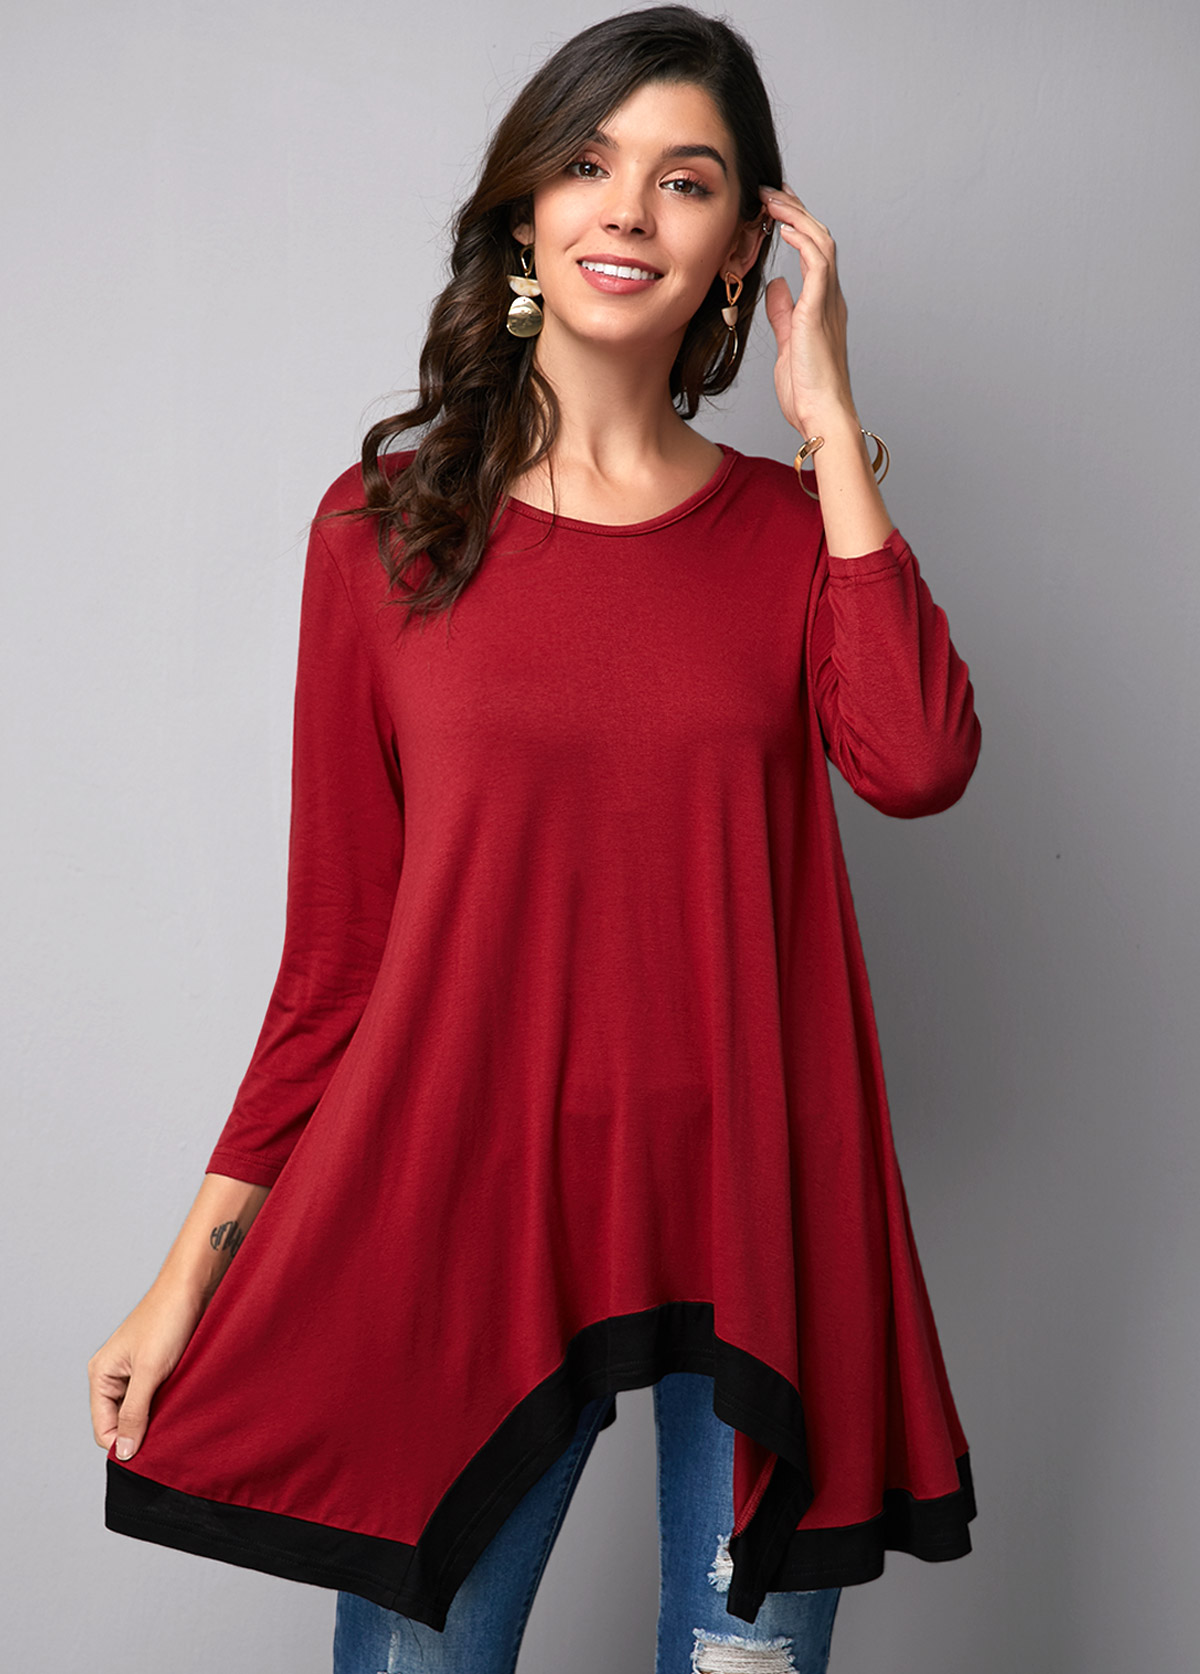 Asymmetric Hem Round Neck Wine Red T Shirt